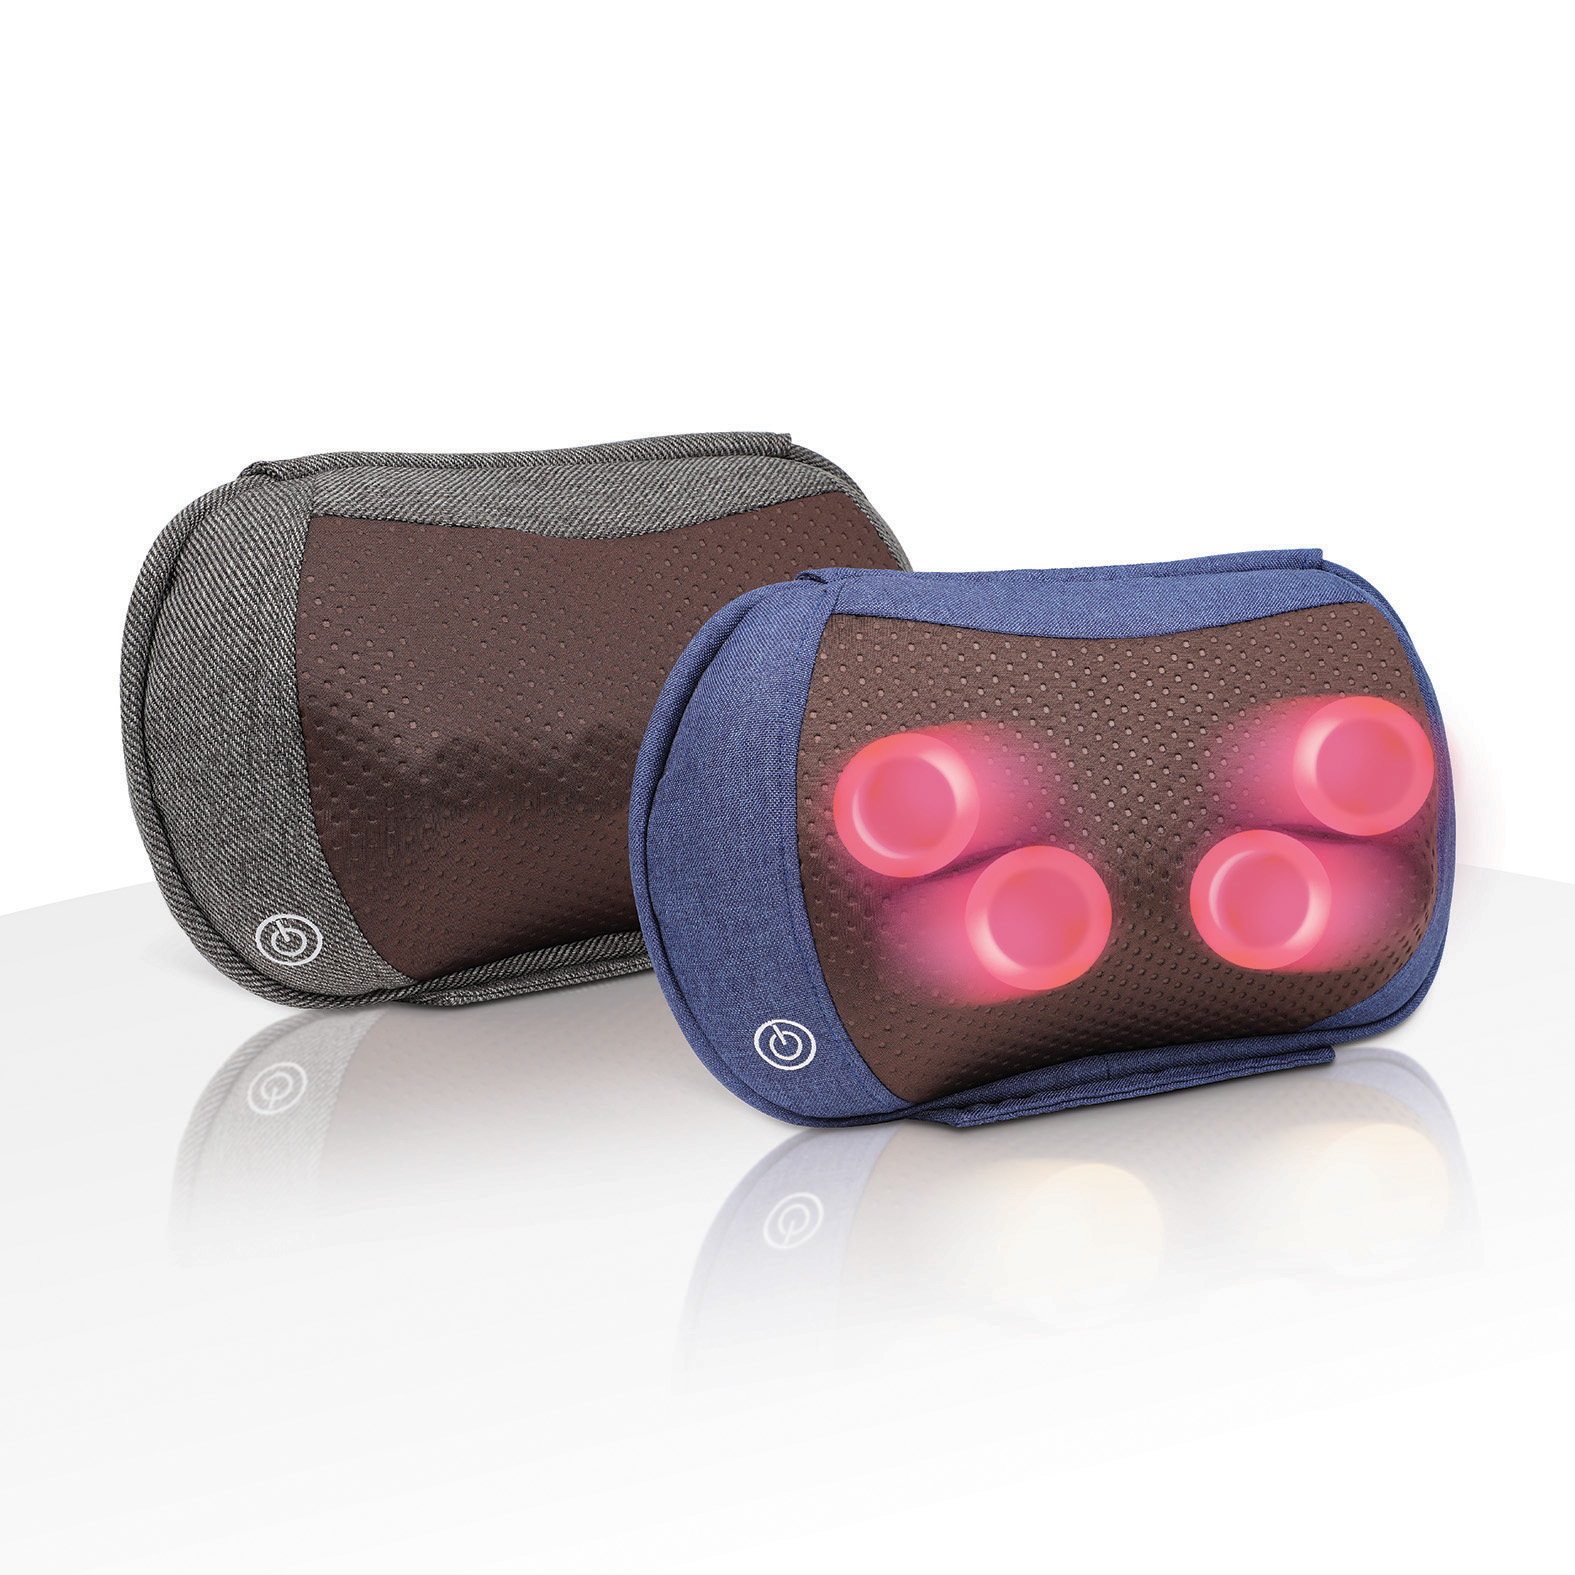 KneadMe Massage Cushion, Massage Pillow